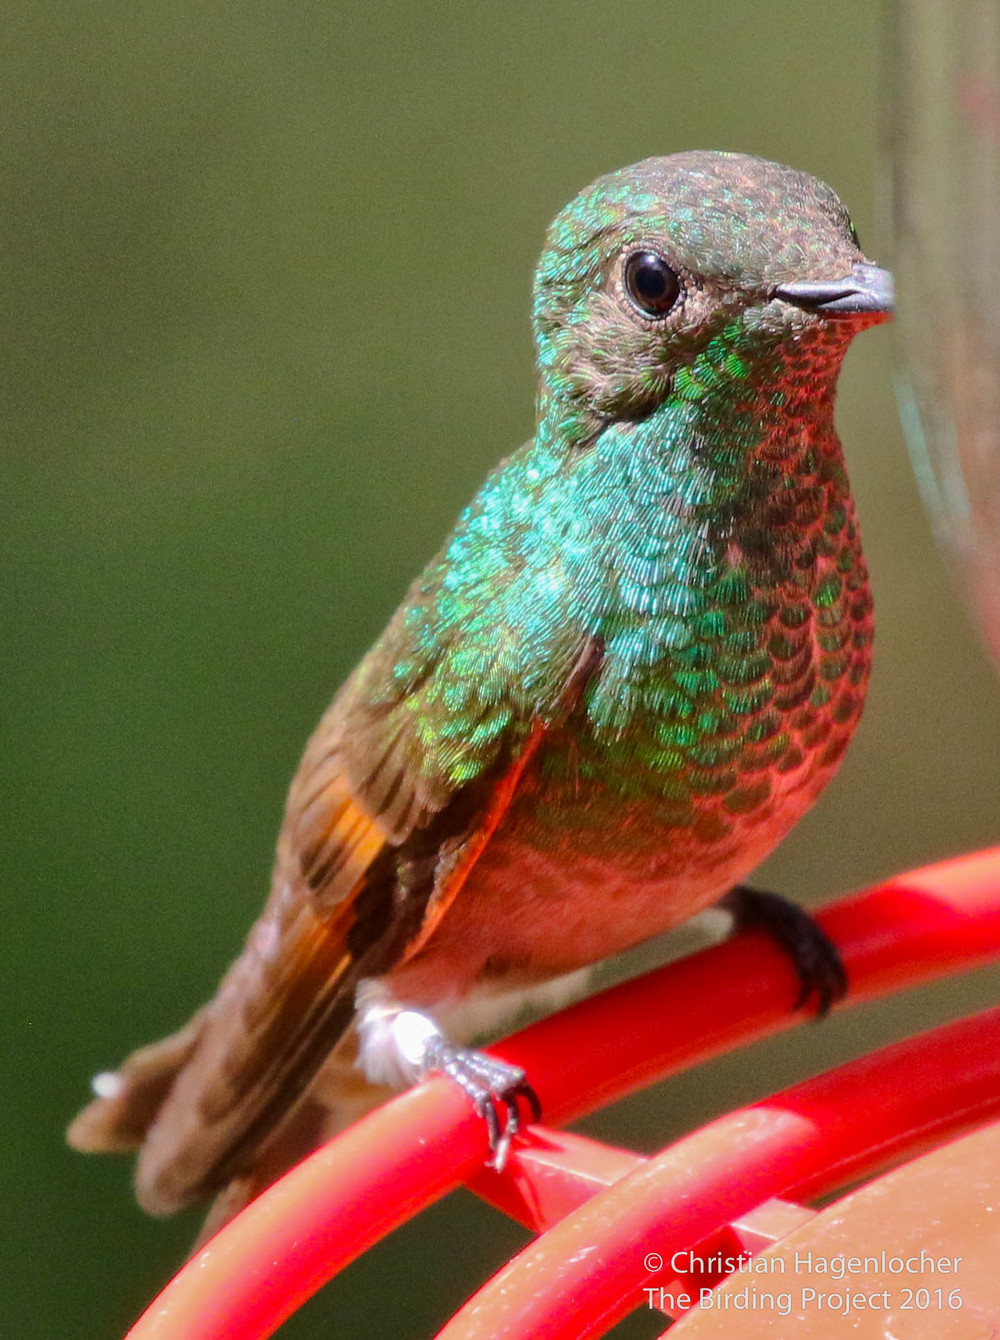 This is the look I had of the Berylline Hummingbird through my binoculars. Pretty neat stuff!